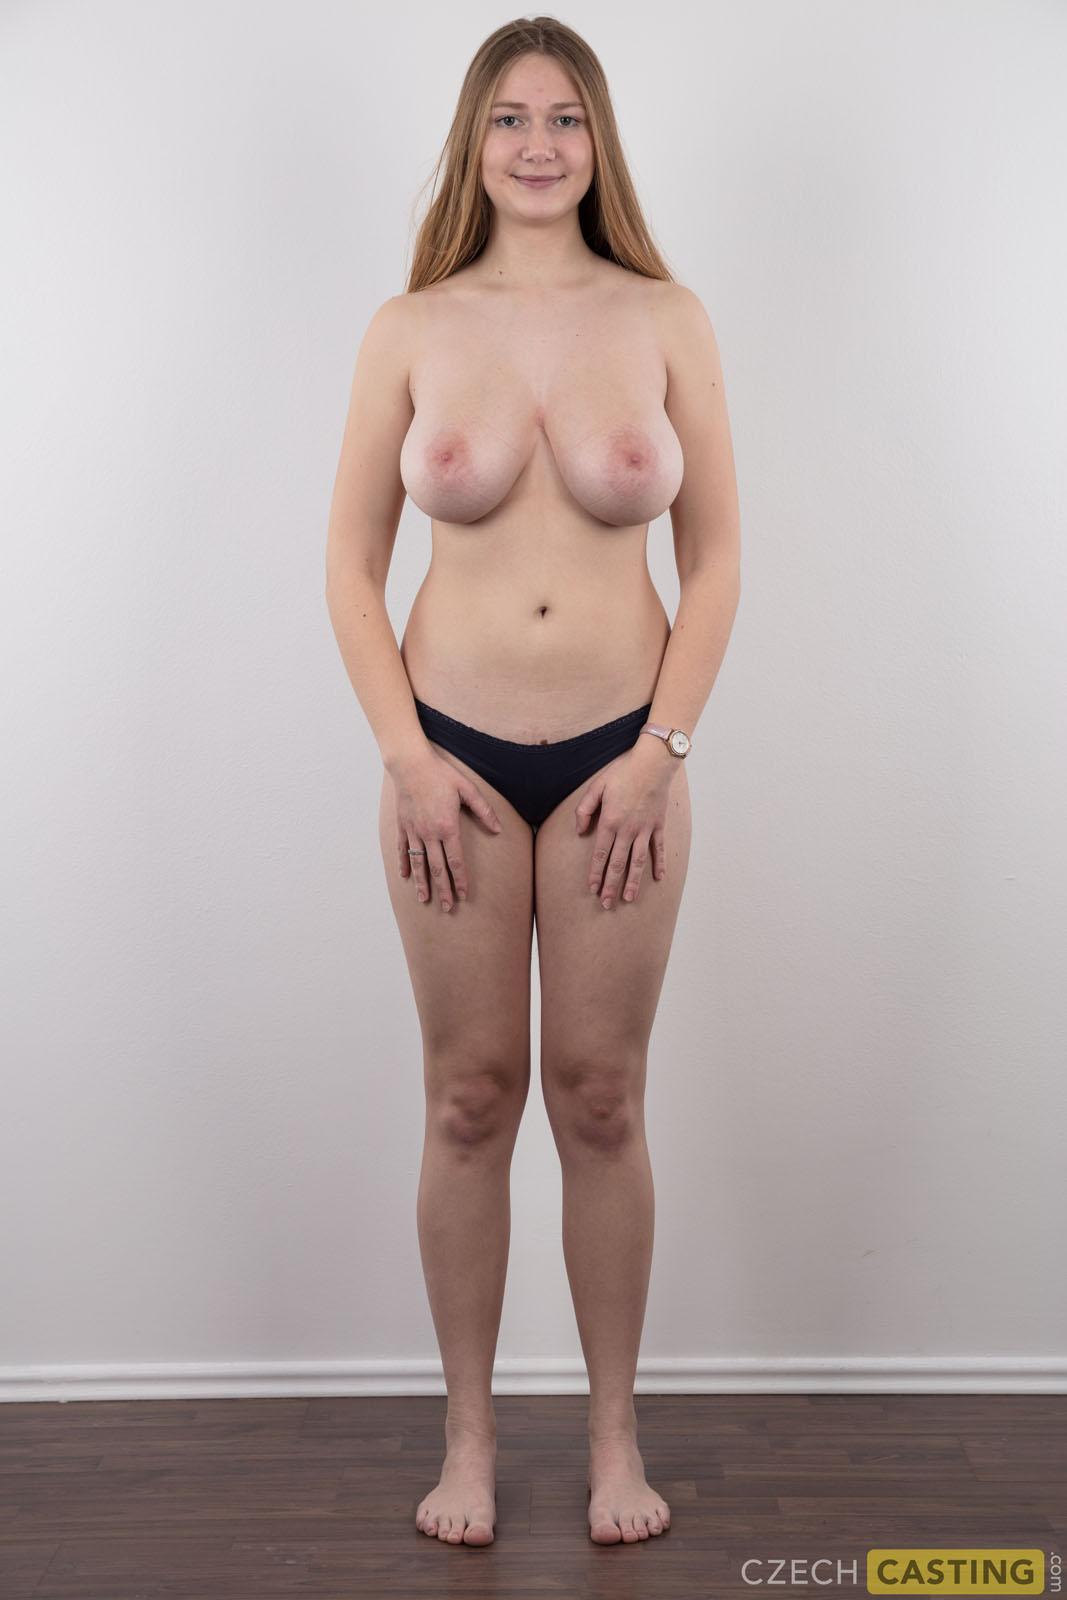 Katka kyptova nude czech free pics